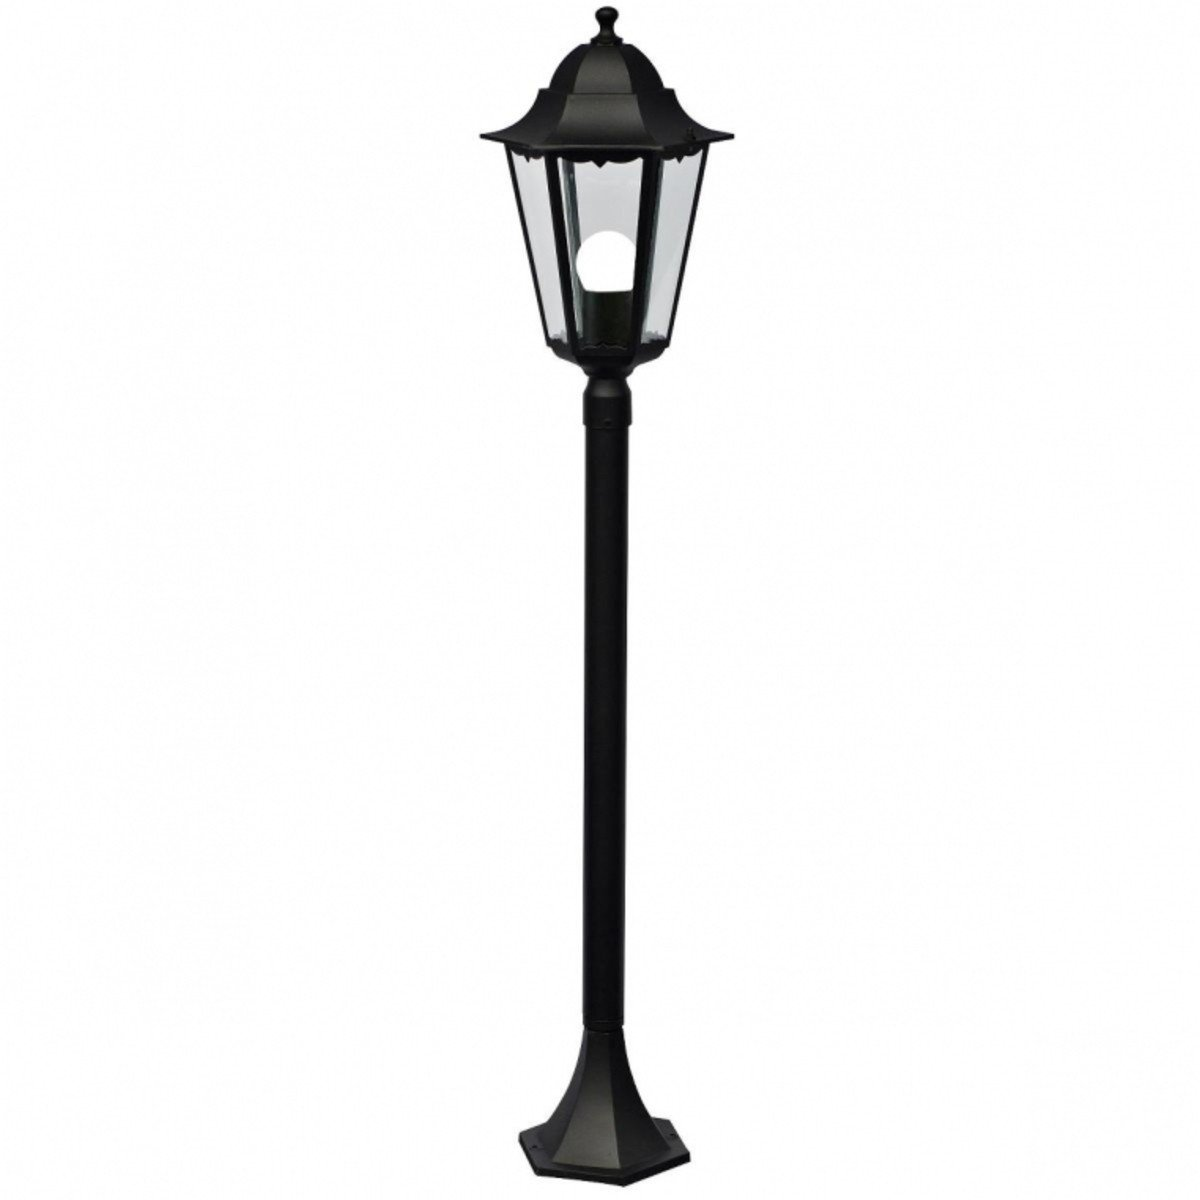 Lampa de gradina, felinar negru, metalic, vinatge